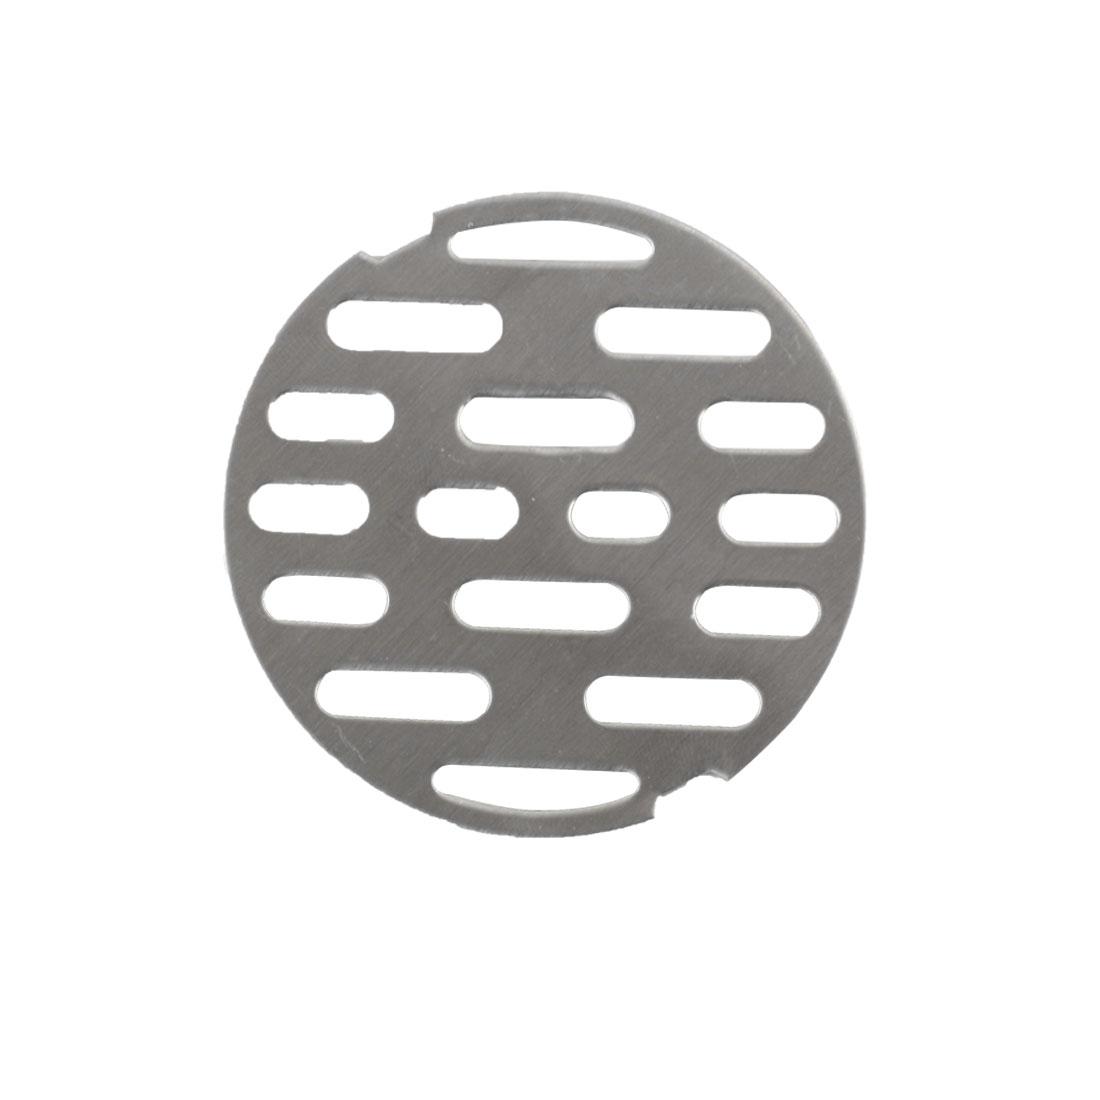 2.6 Inch Snap-in Floor Drain Cover Hair Catcher Sink Drain Strainer Stopper